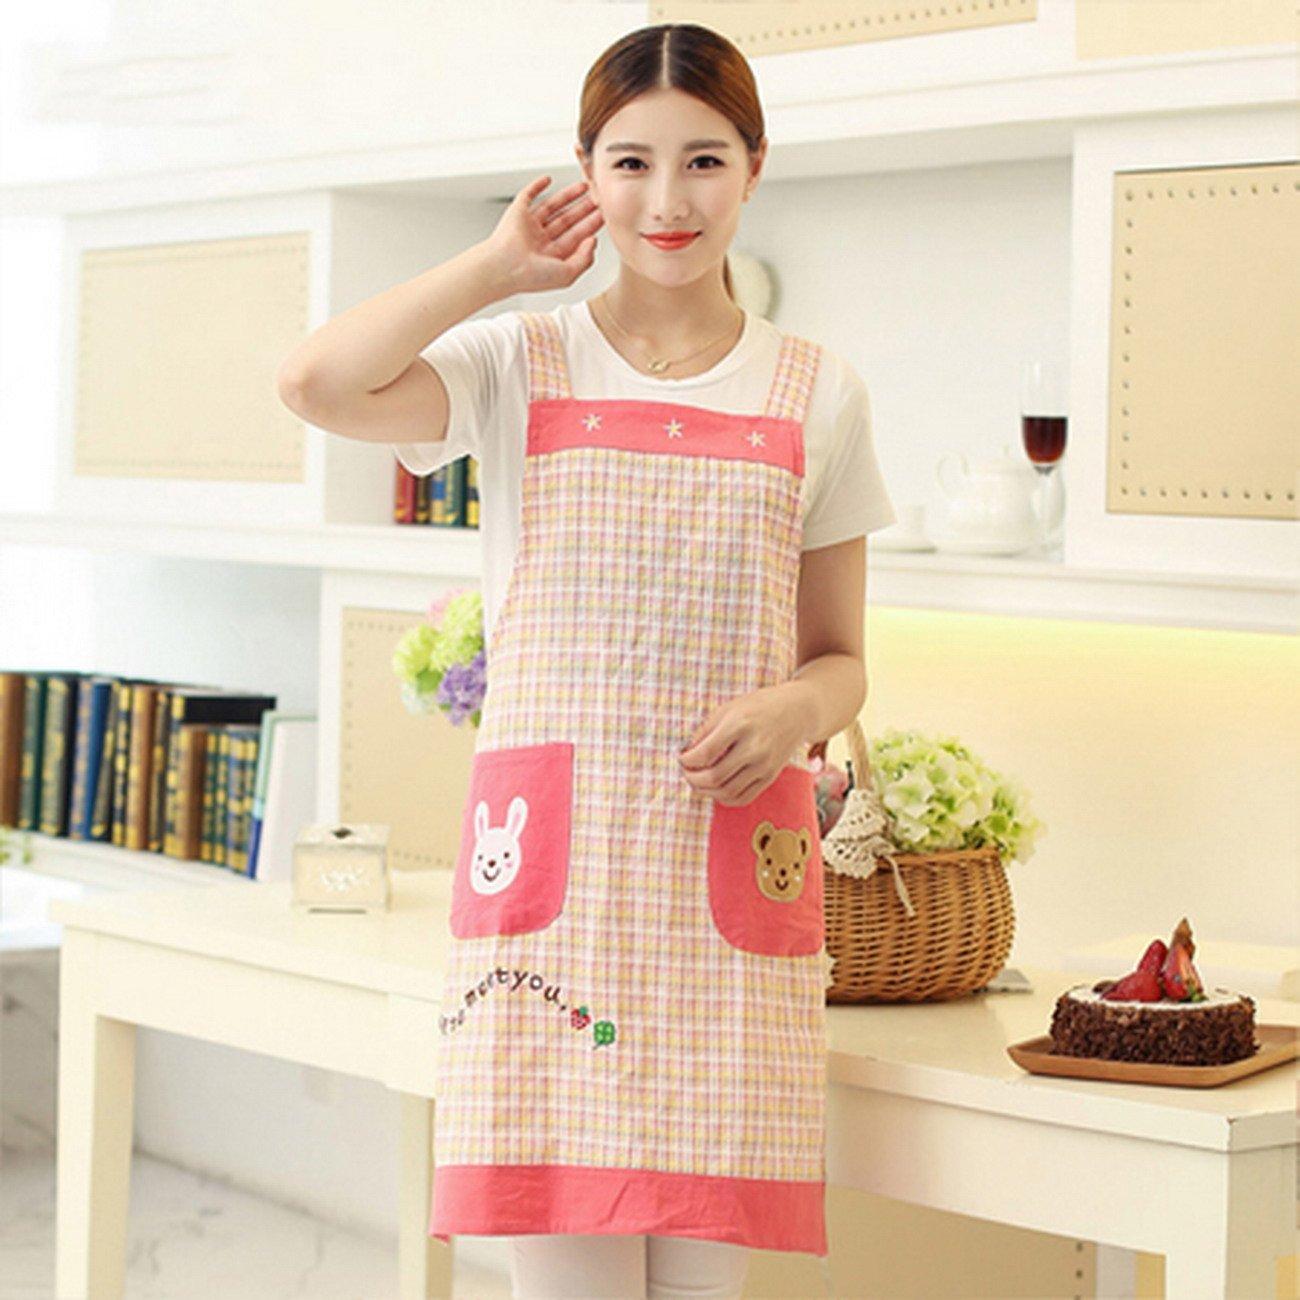 Geranjie Home Furnishingエプロンスカーフマニキュア韓国レストランキッチンエプロン幼稚園Overalls for Woman   B078RH3SP3